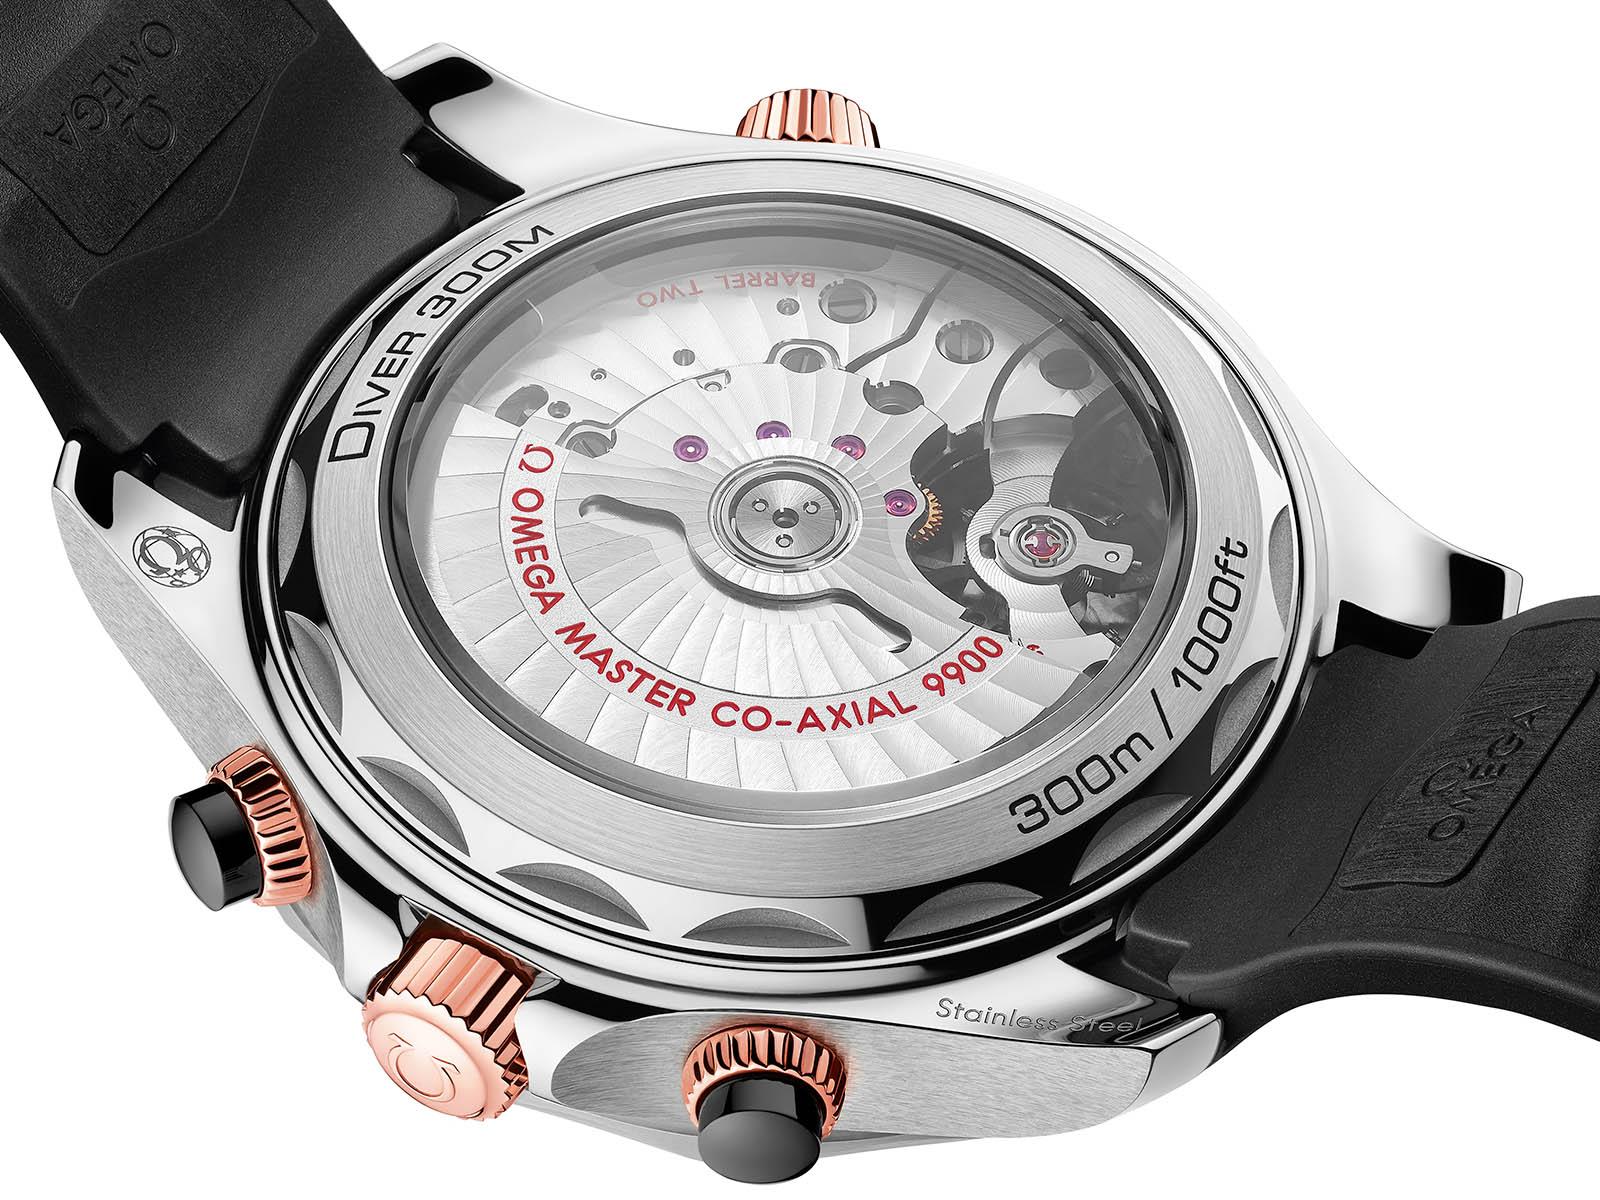 210-22-44-51-01-001-omega-seamaster-diver-300m-chronograph-5.jpg